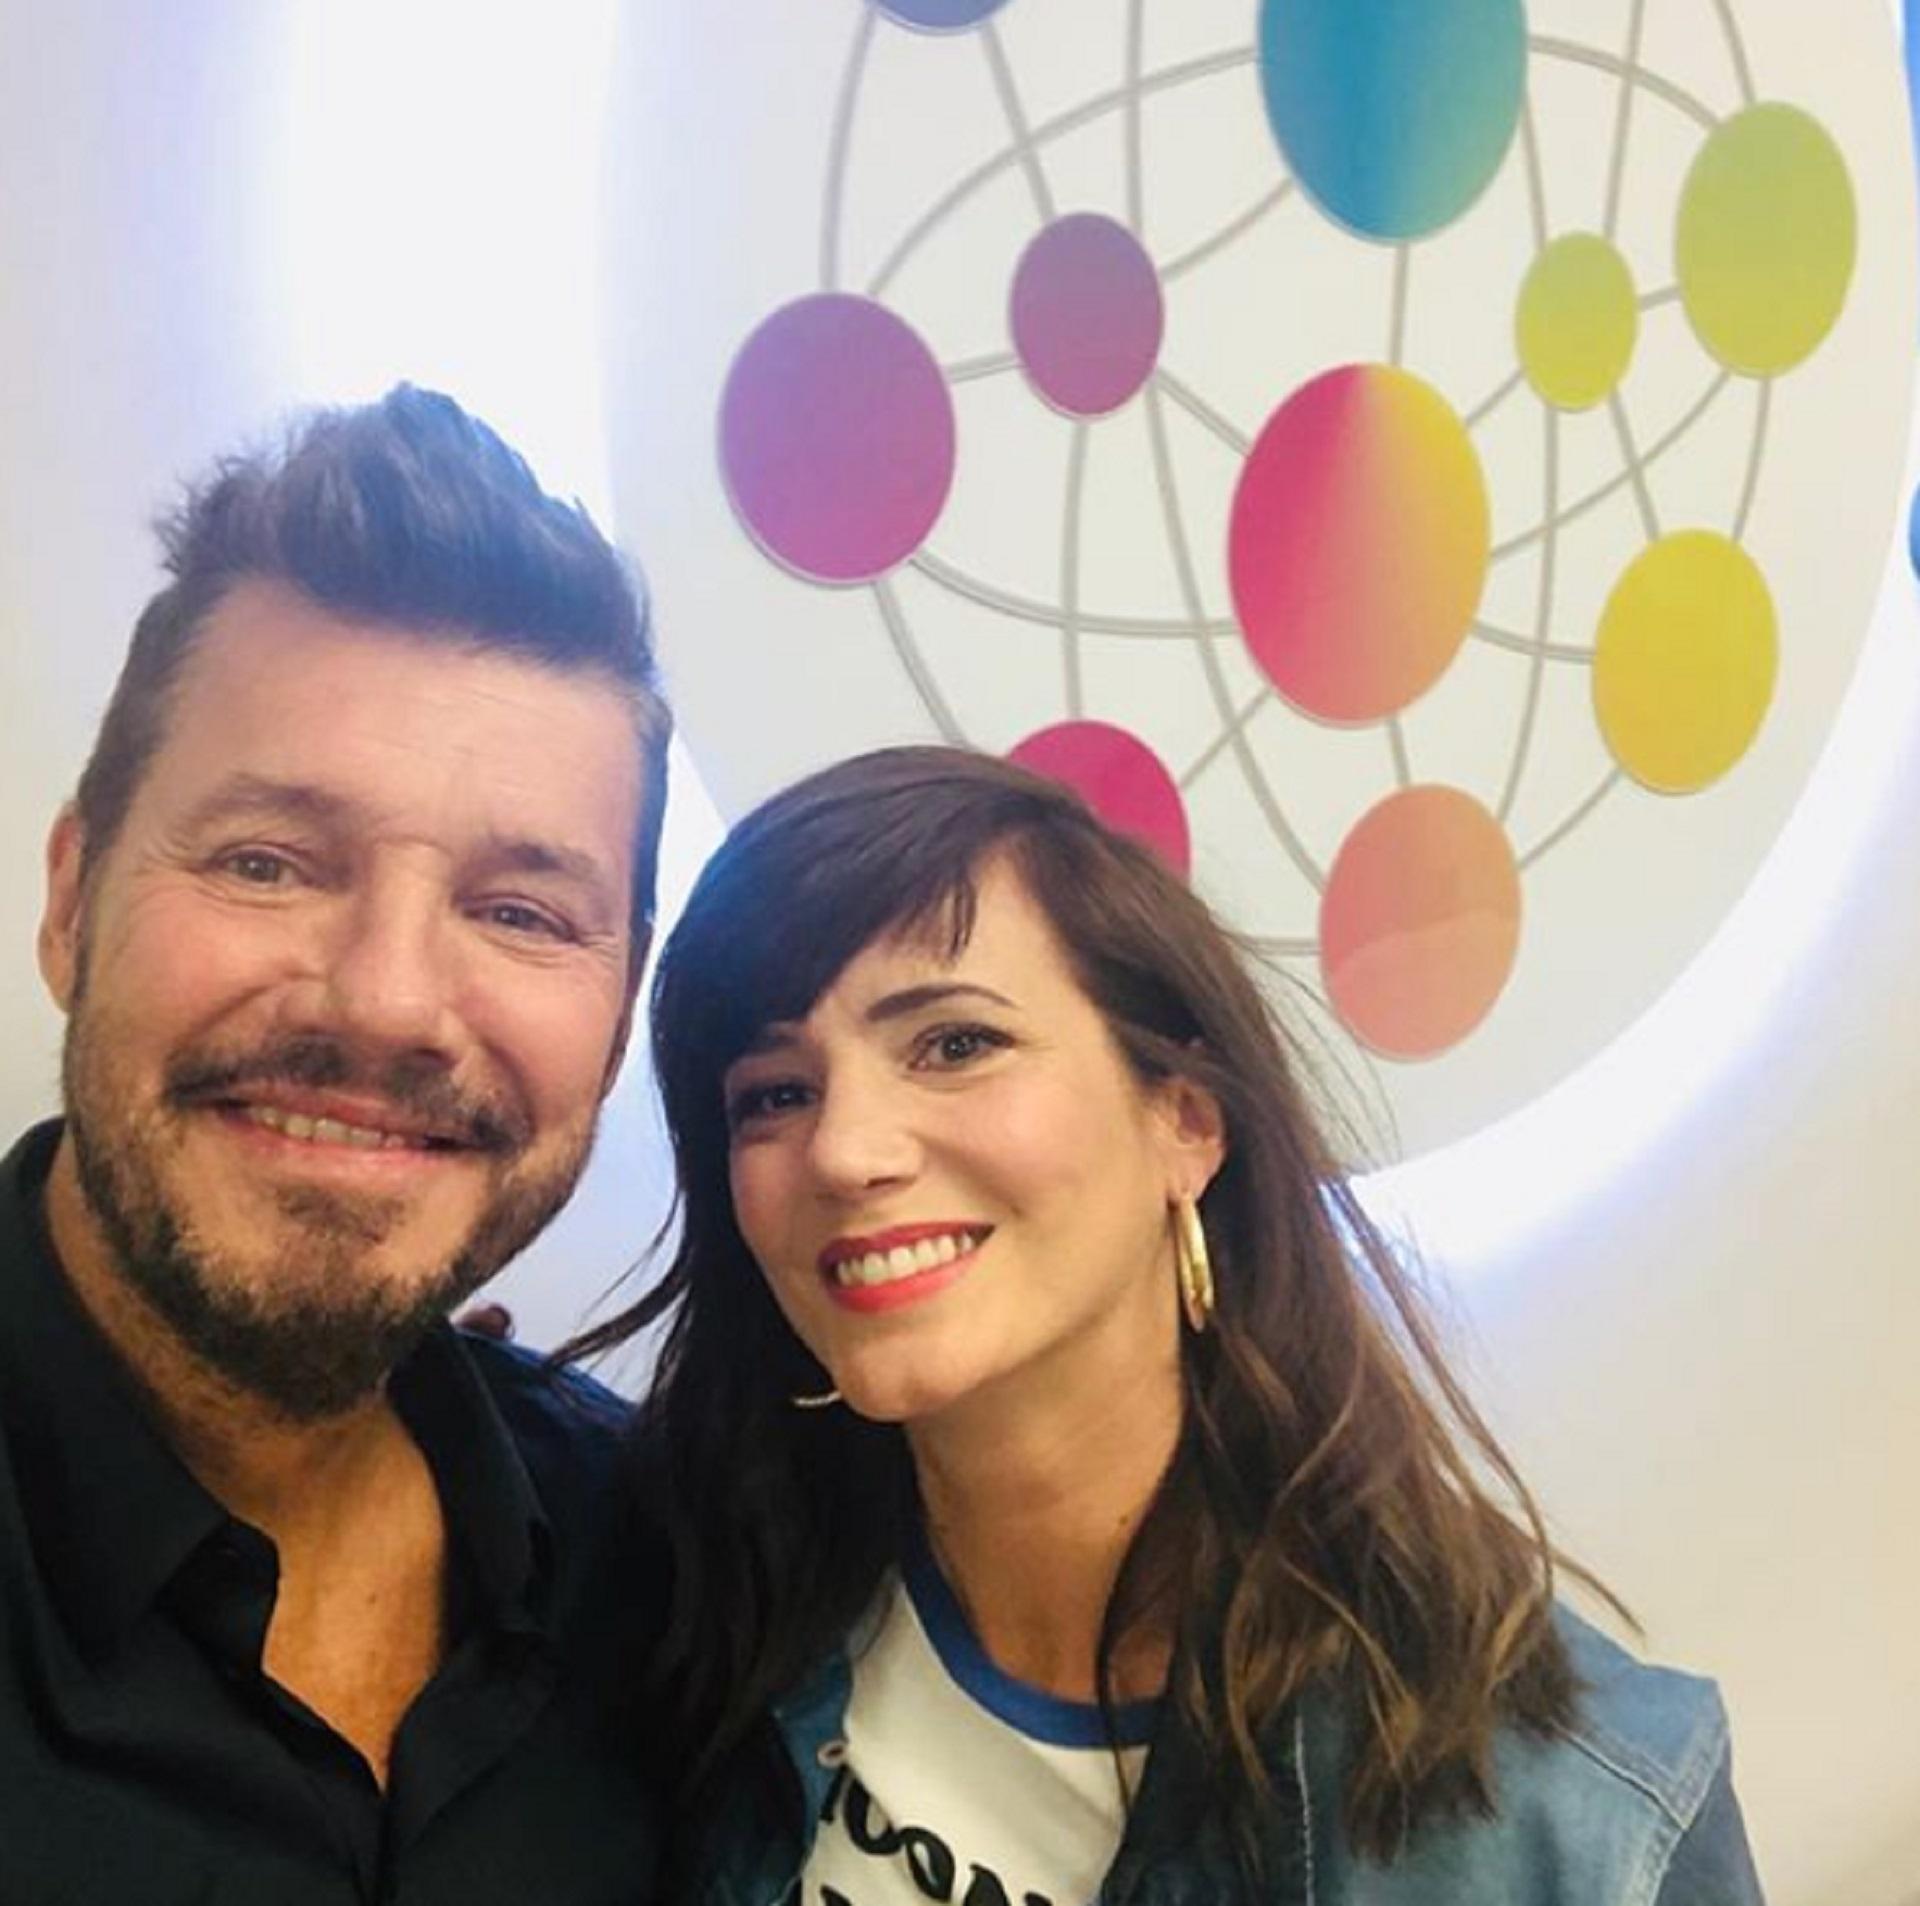 Marcelo Tinelli y Griselda Siciliani (Foto: Instagram/@CuervoTinelli)